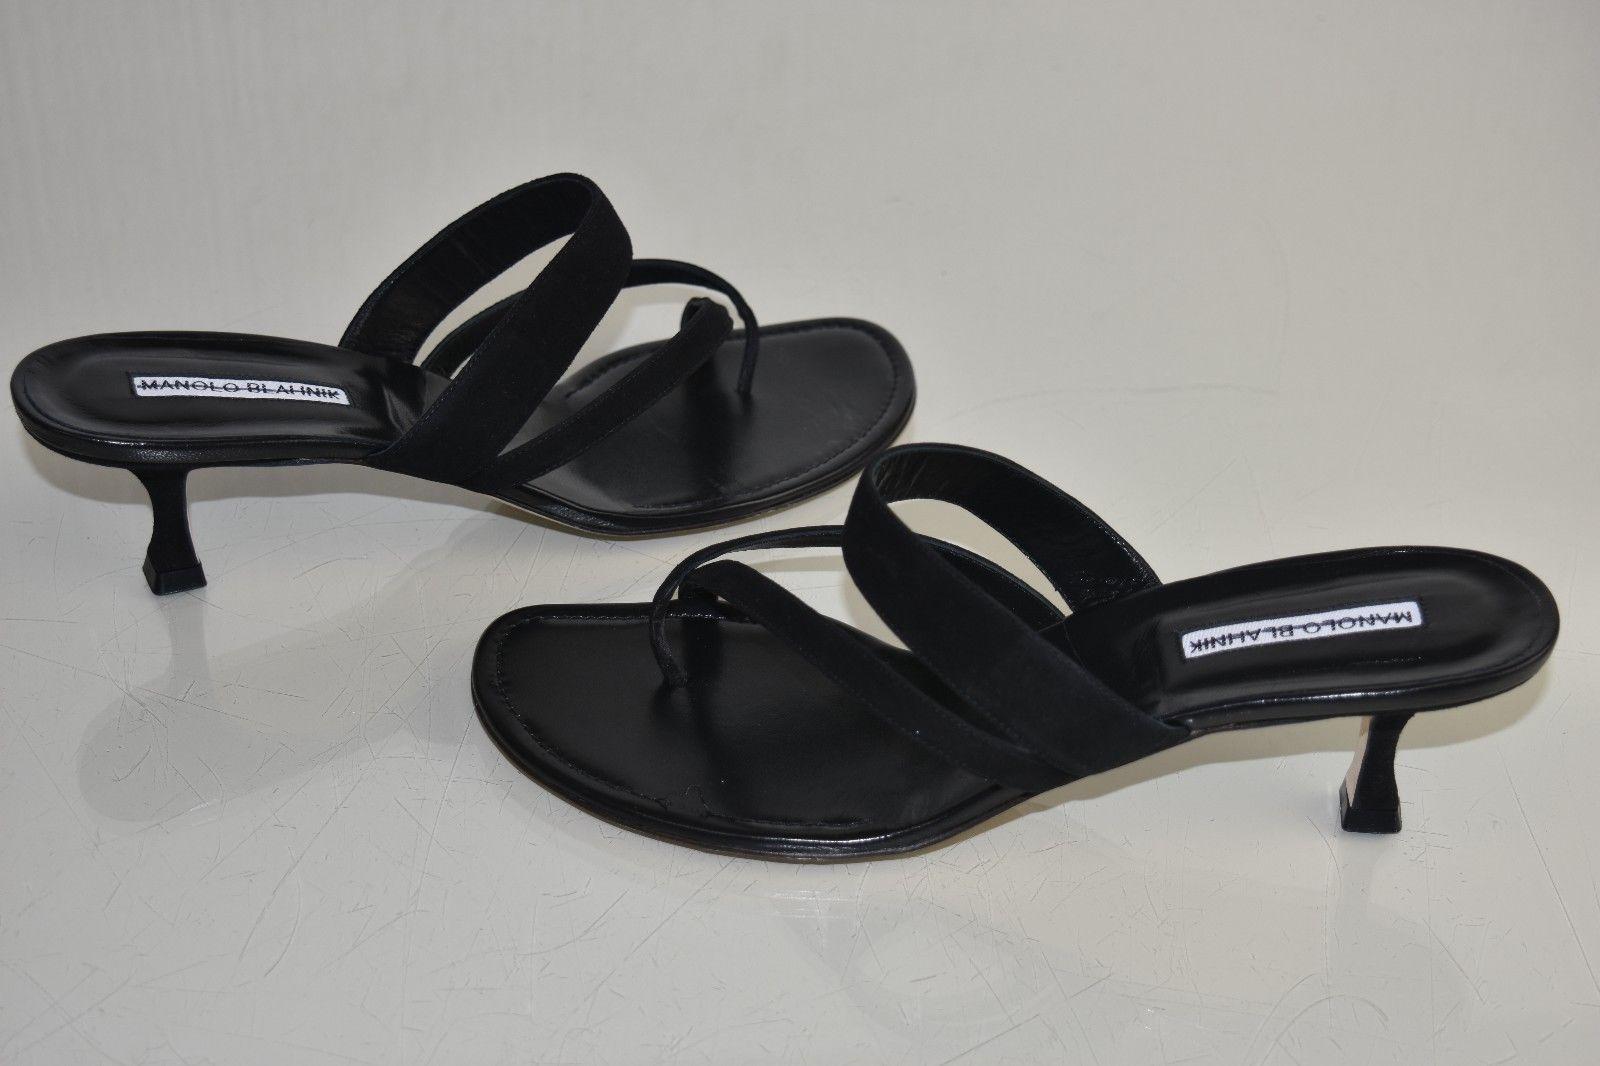 New Manolo Blahnik Susa 50 Black Suede Slide Kitten Heels Sandals Pumps Shoes 41 Kitten Heel Sandals Pump Shoes Kitten Heels